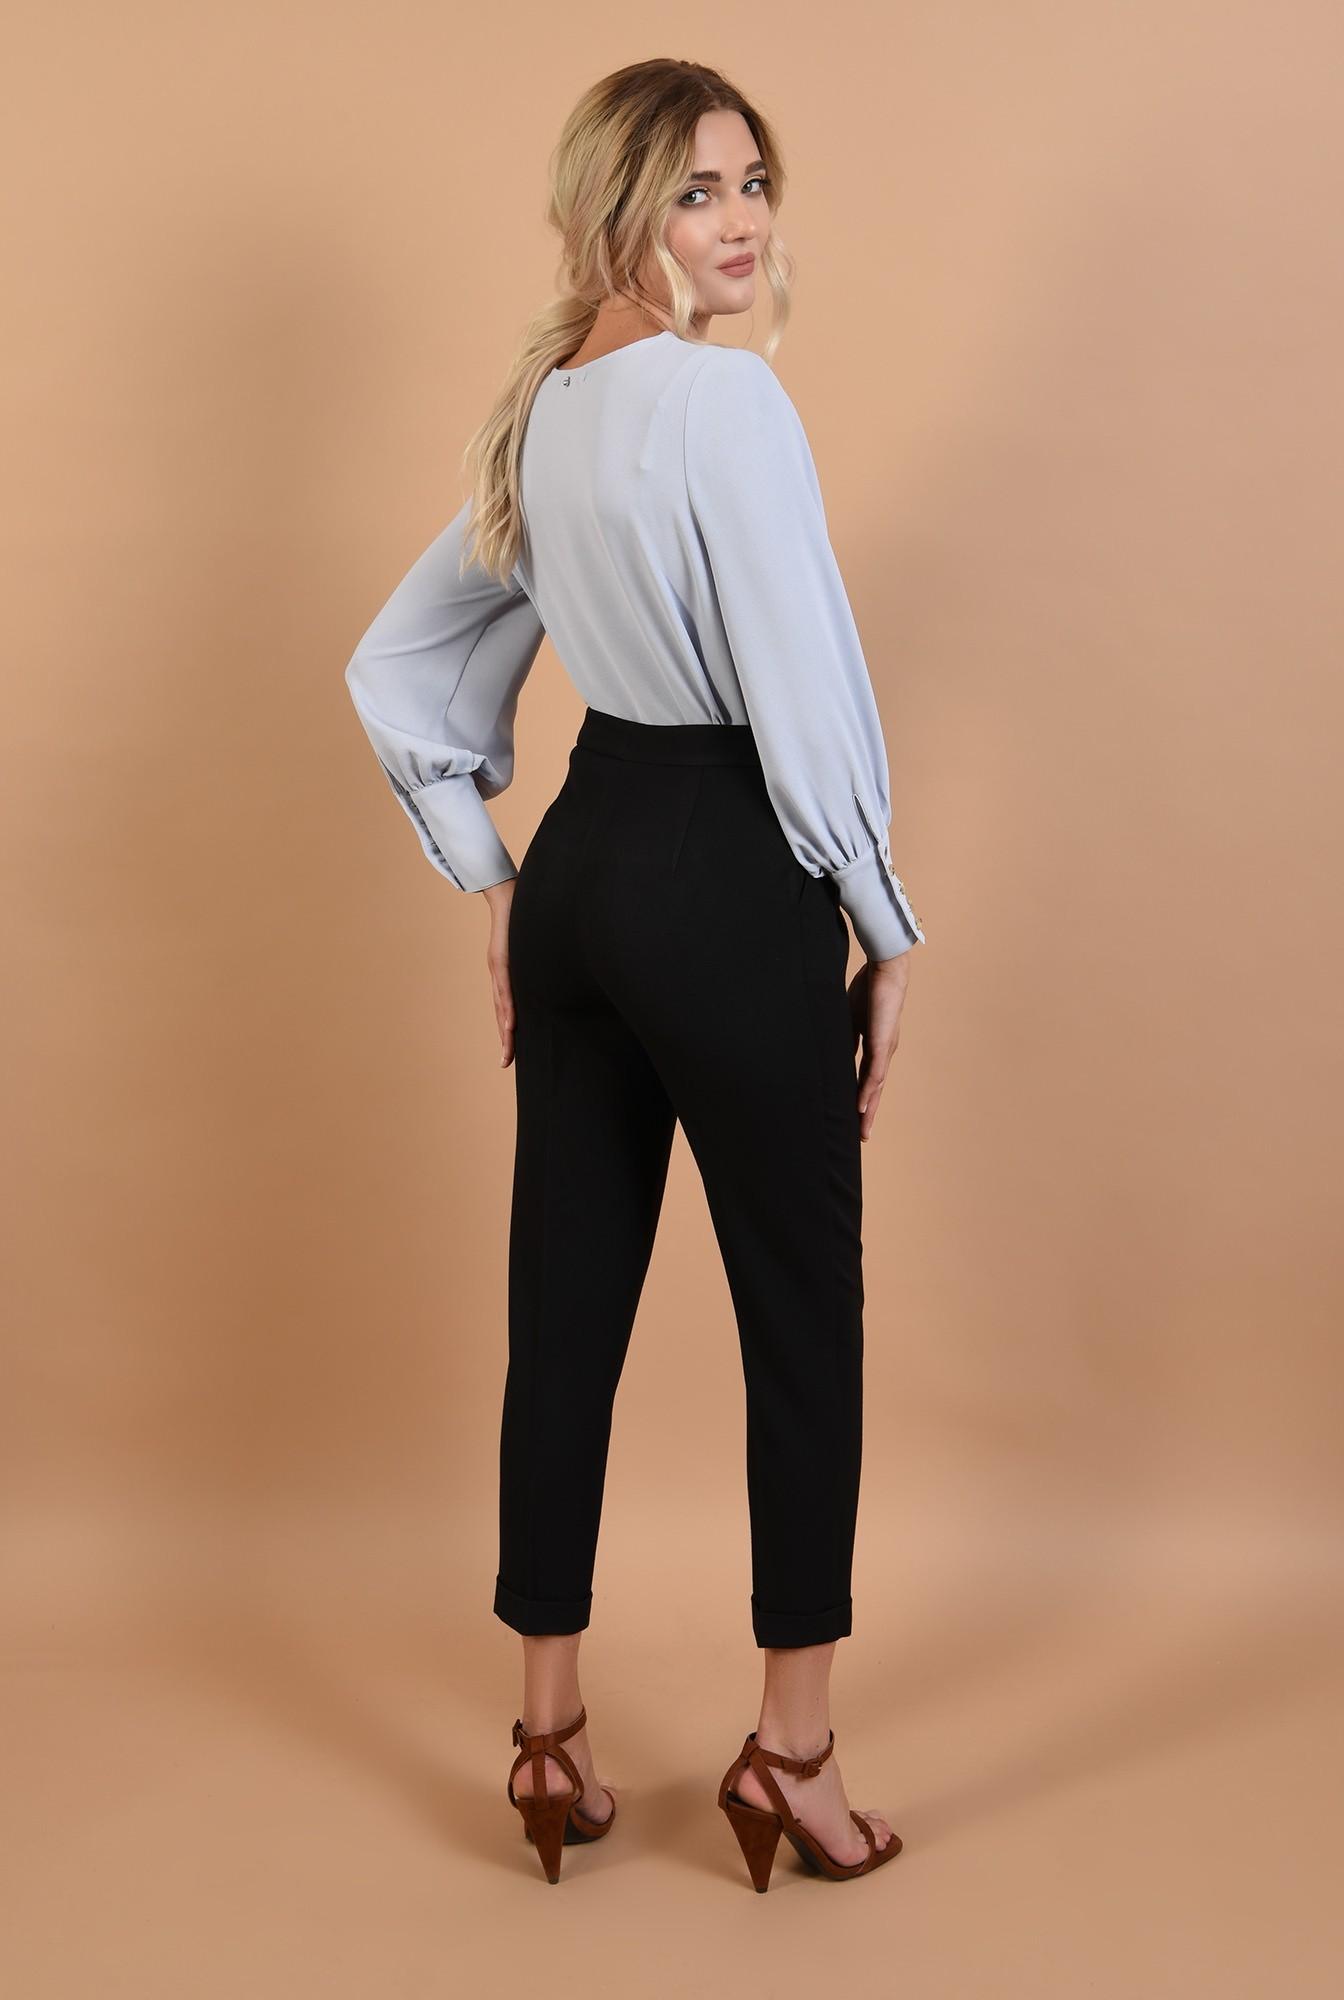 1 - 360 - pantaloni casual, negri, cu mansete, talie inalta